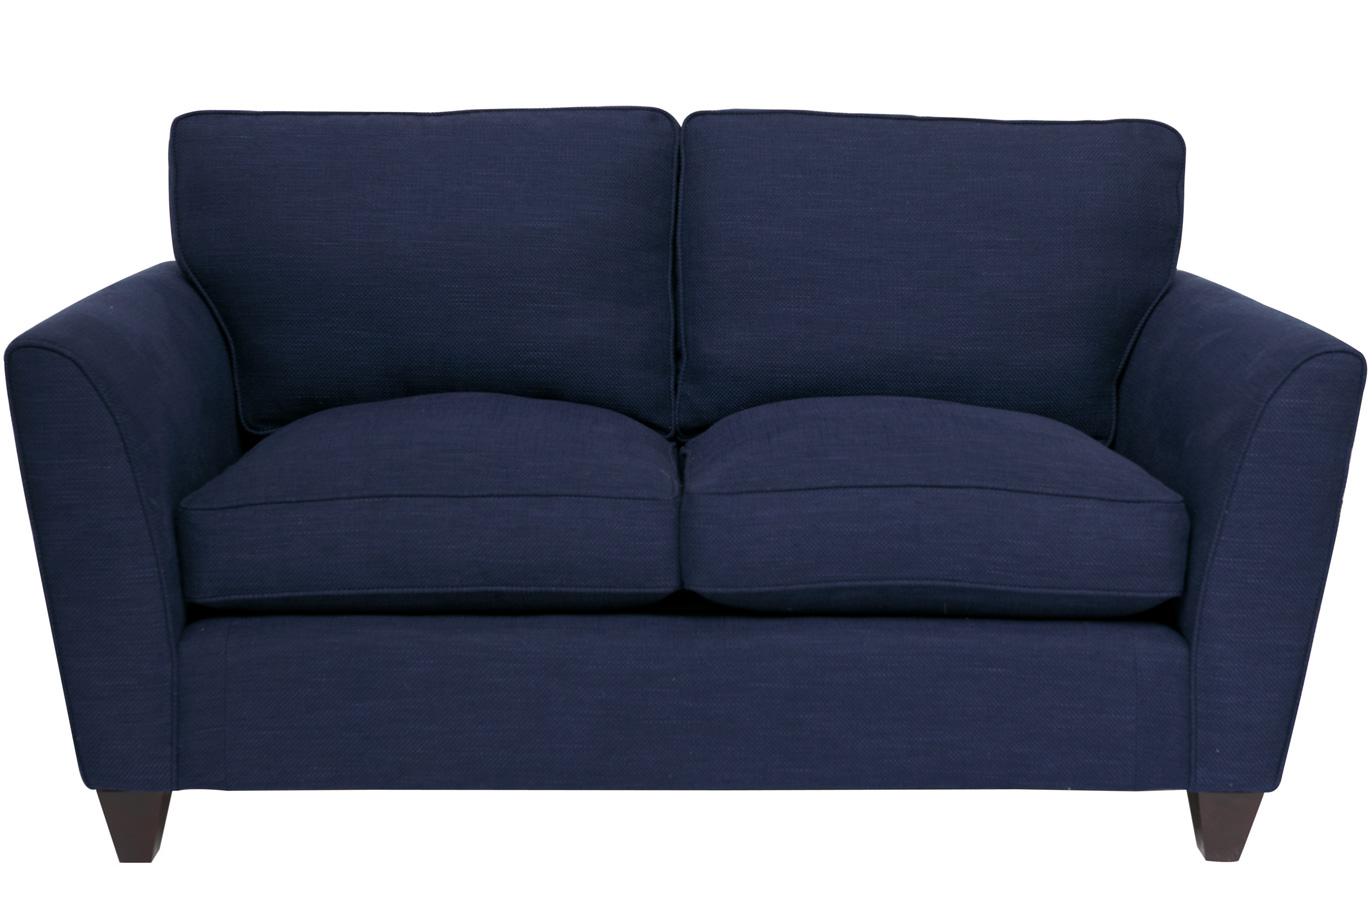 Laura Ashley's 'Ashton' 2 seater Sofa in Dalton midnight is just £630.